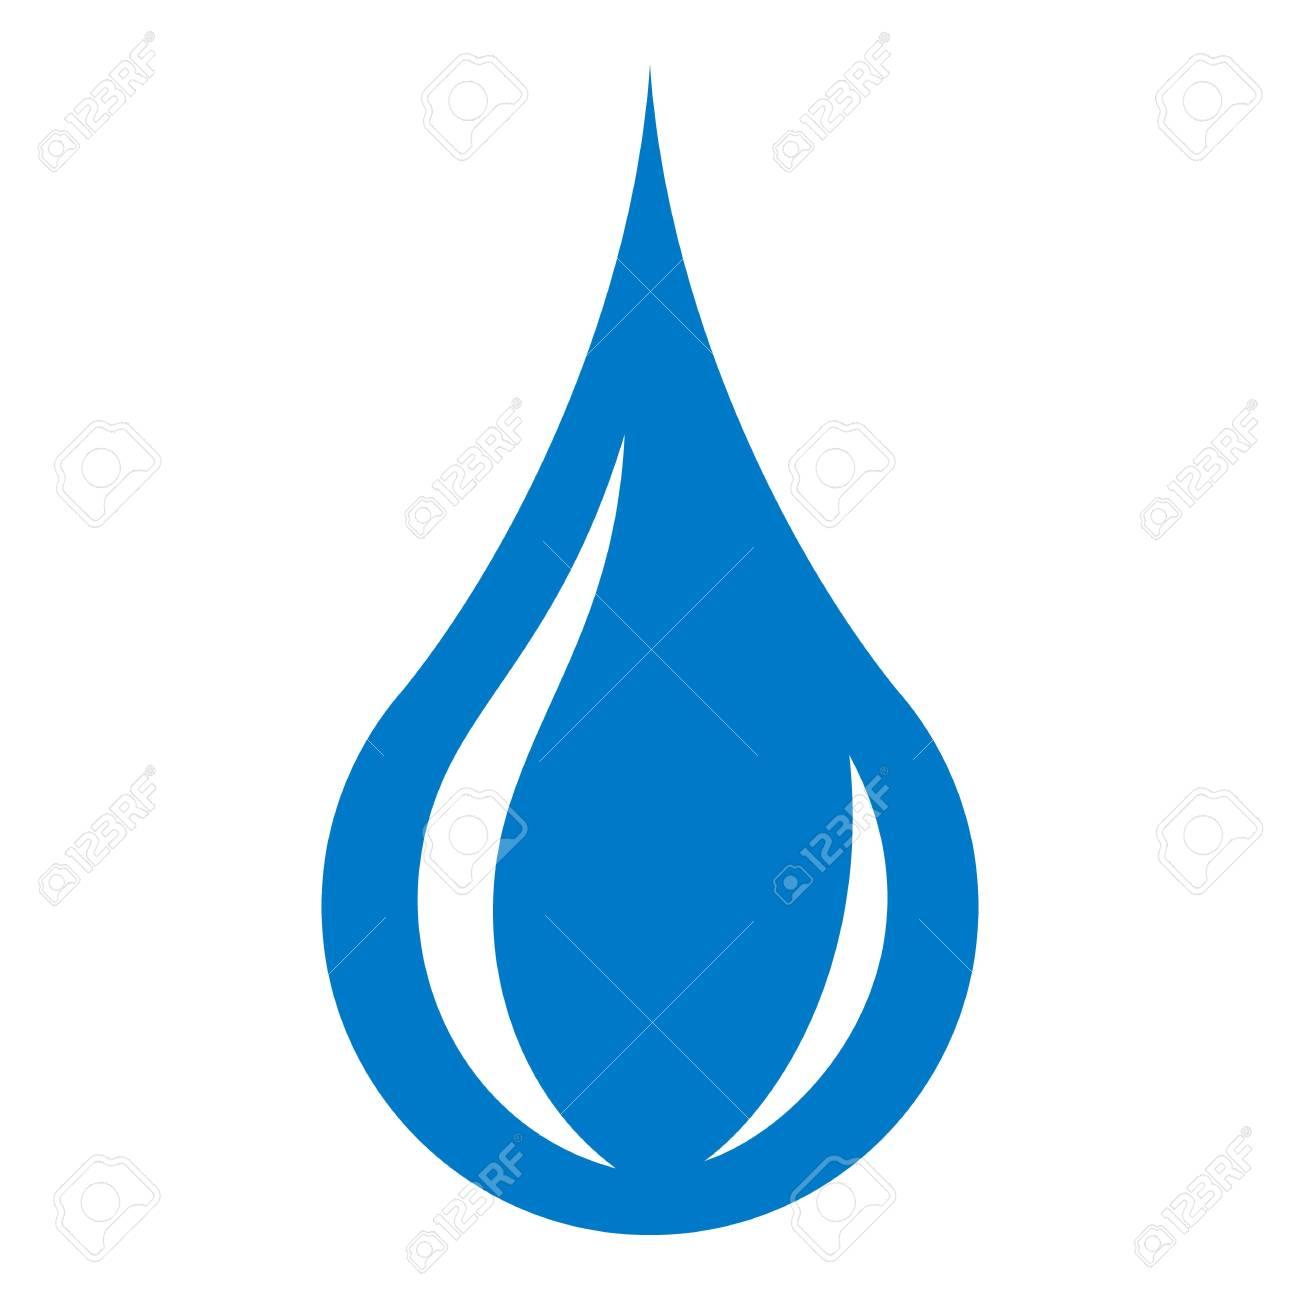 raindrop icon simple illustration of raindrop vector icon for rh 123rf com raindrop vector image raindrop vector art